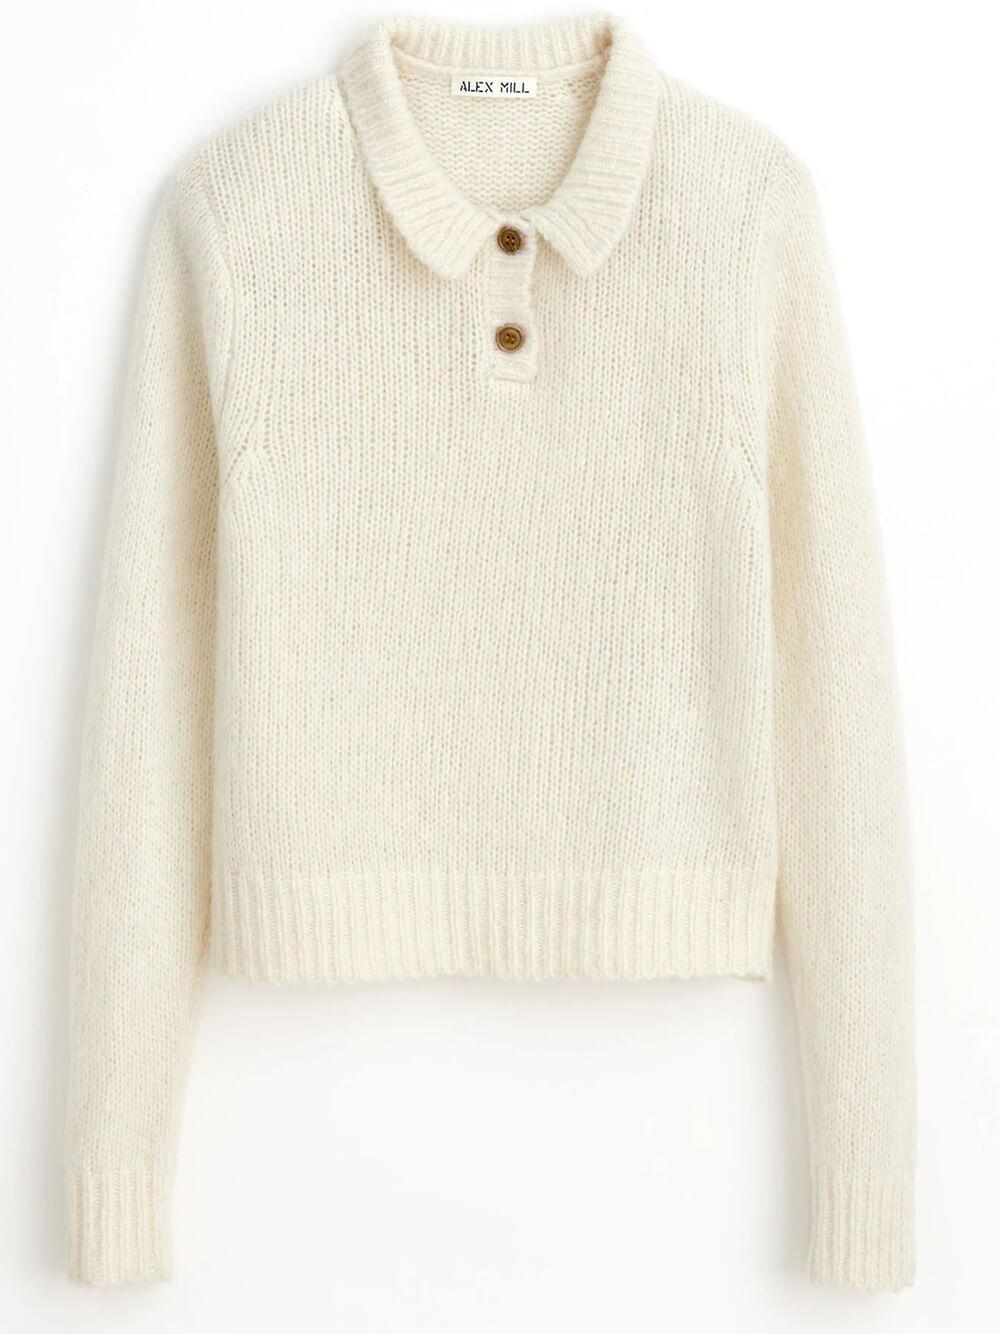 Frank Henley Sweater Item # 208-WW040-2545